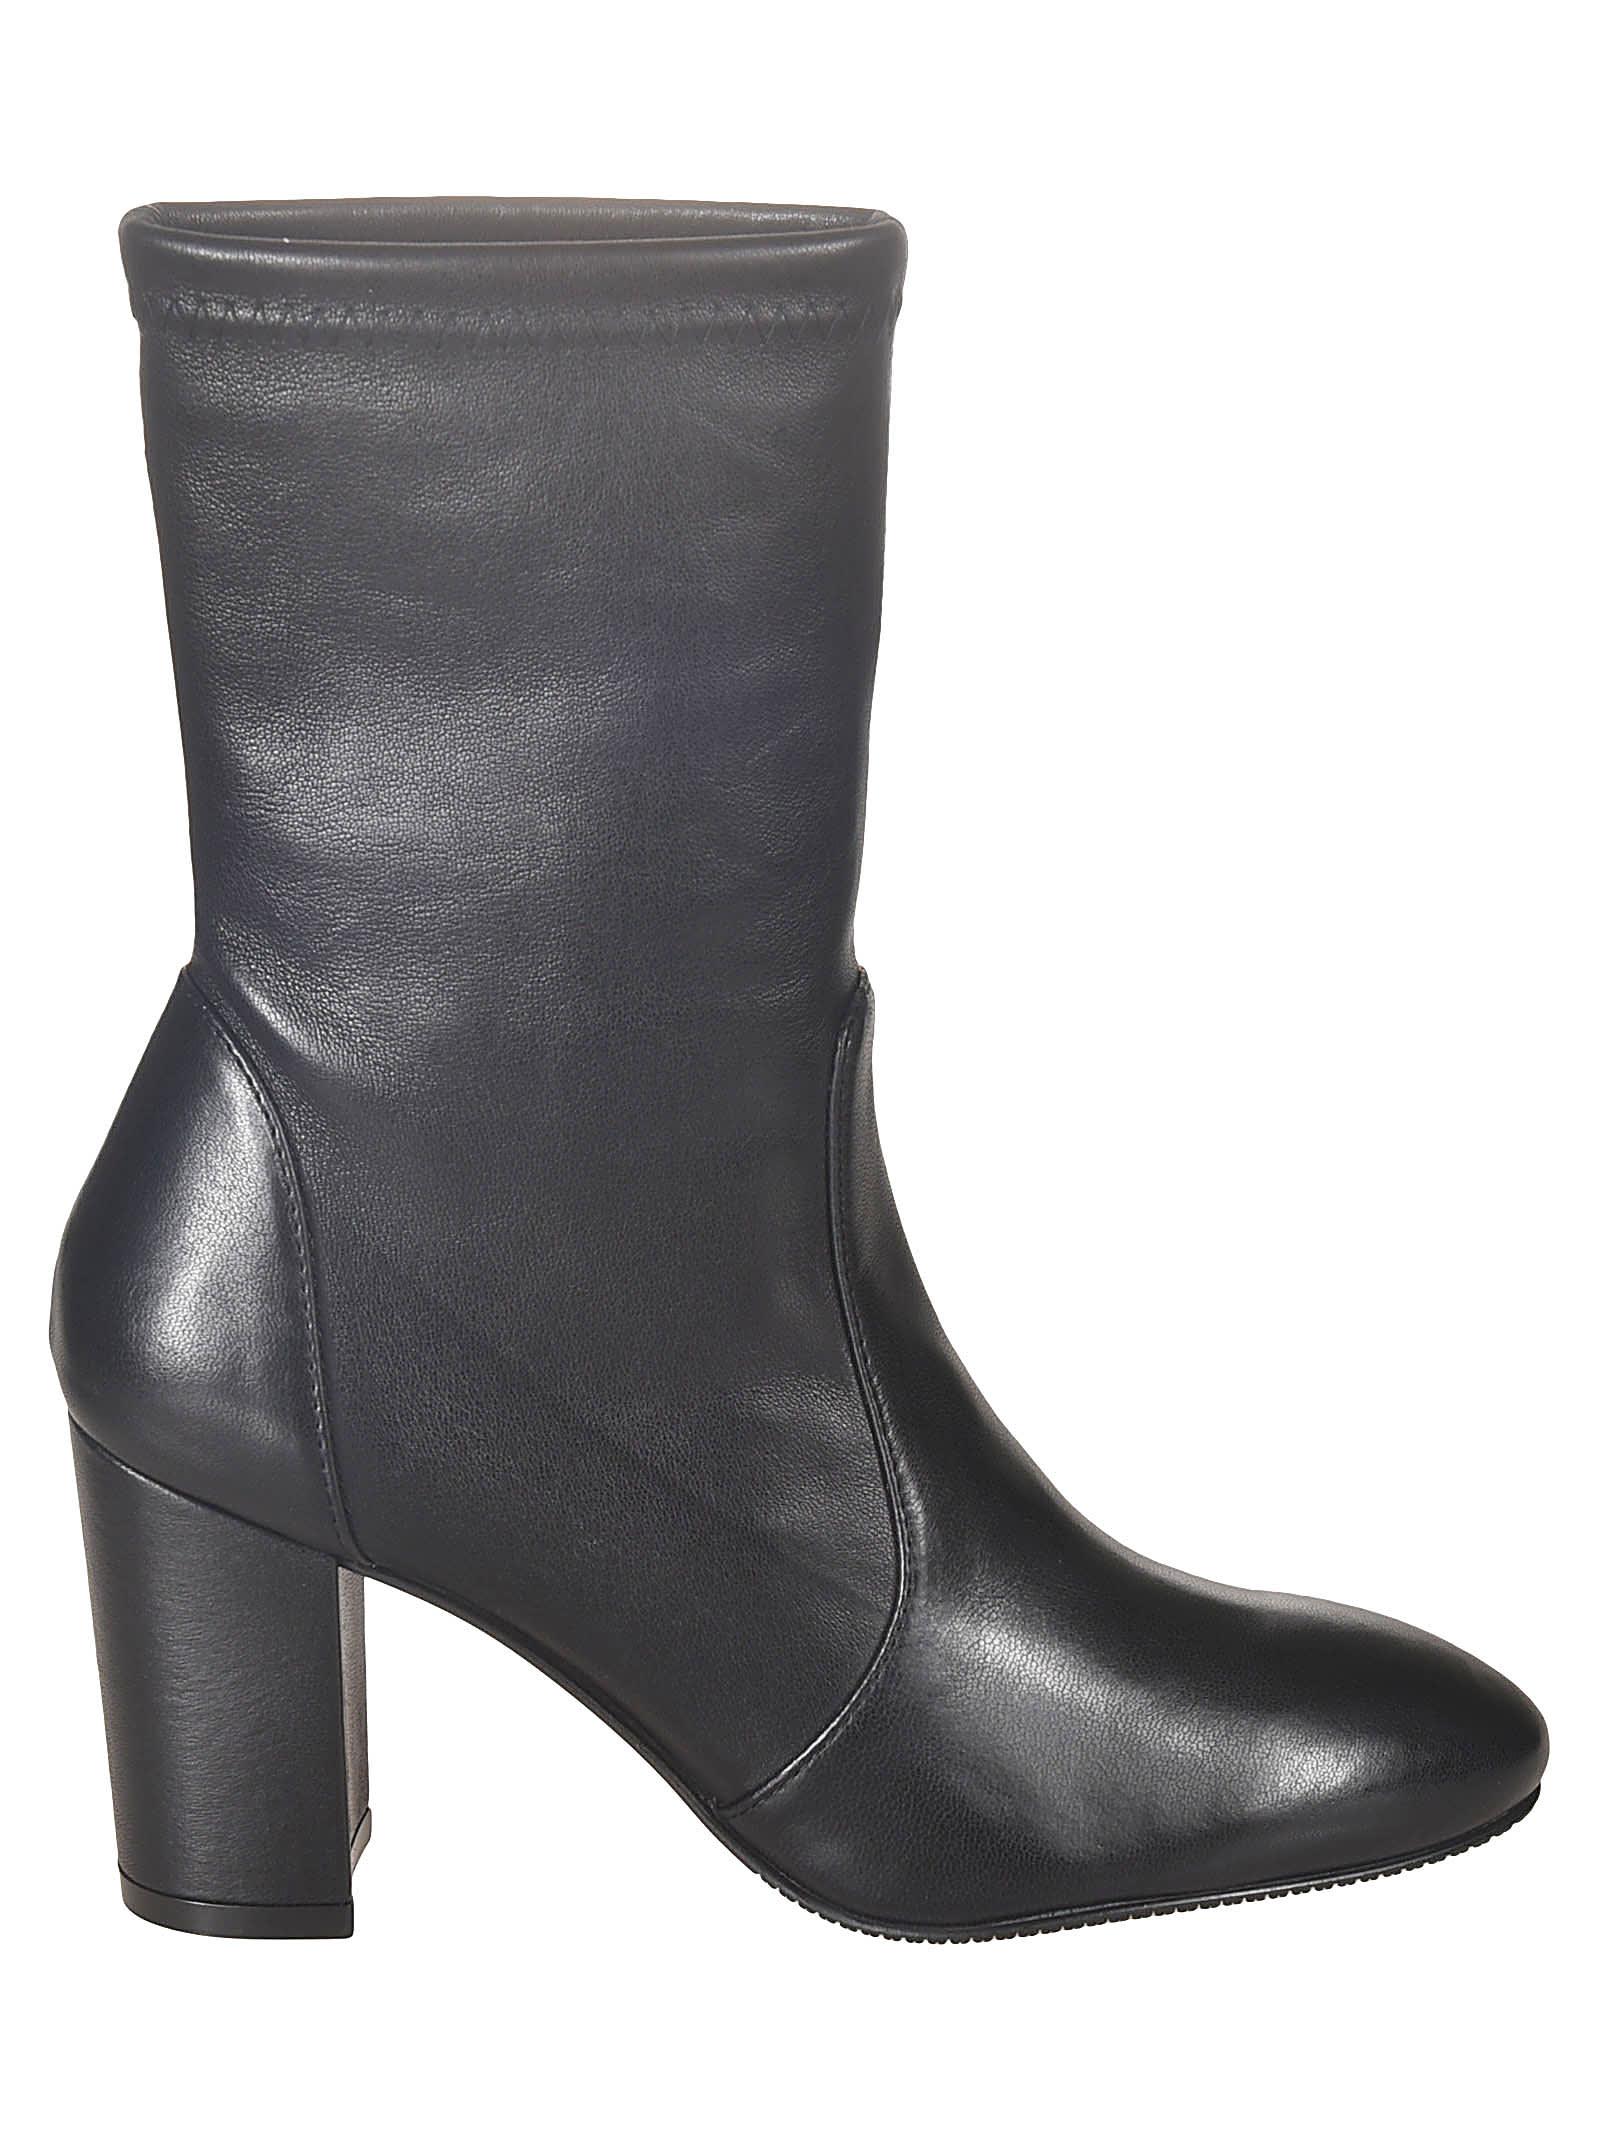 Buy Stuart Weitzman Yuliana Boots online, shop Stuart Weitzman shoes with free shipping